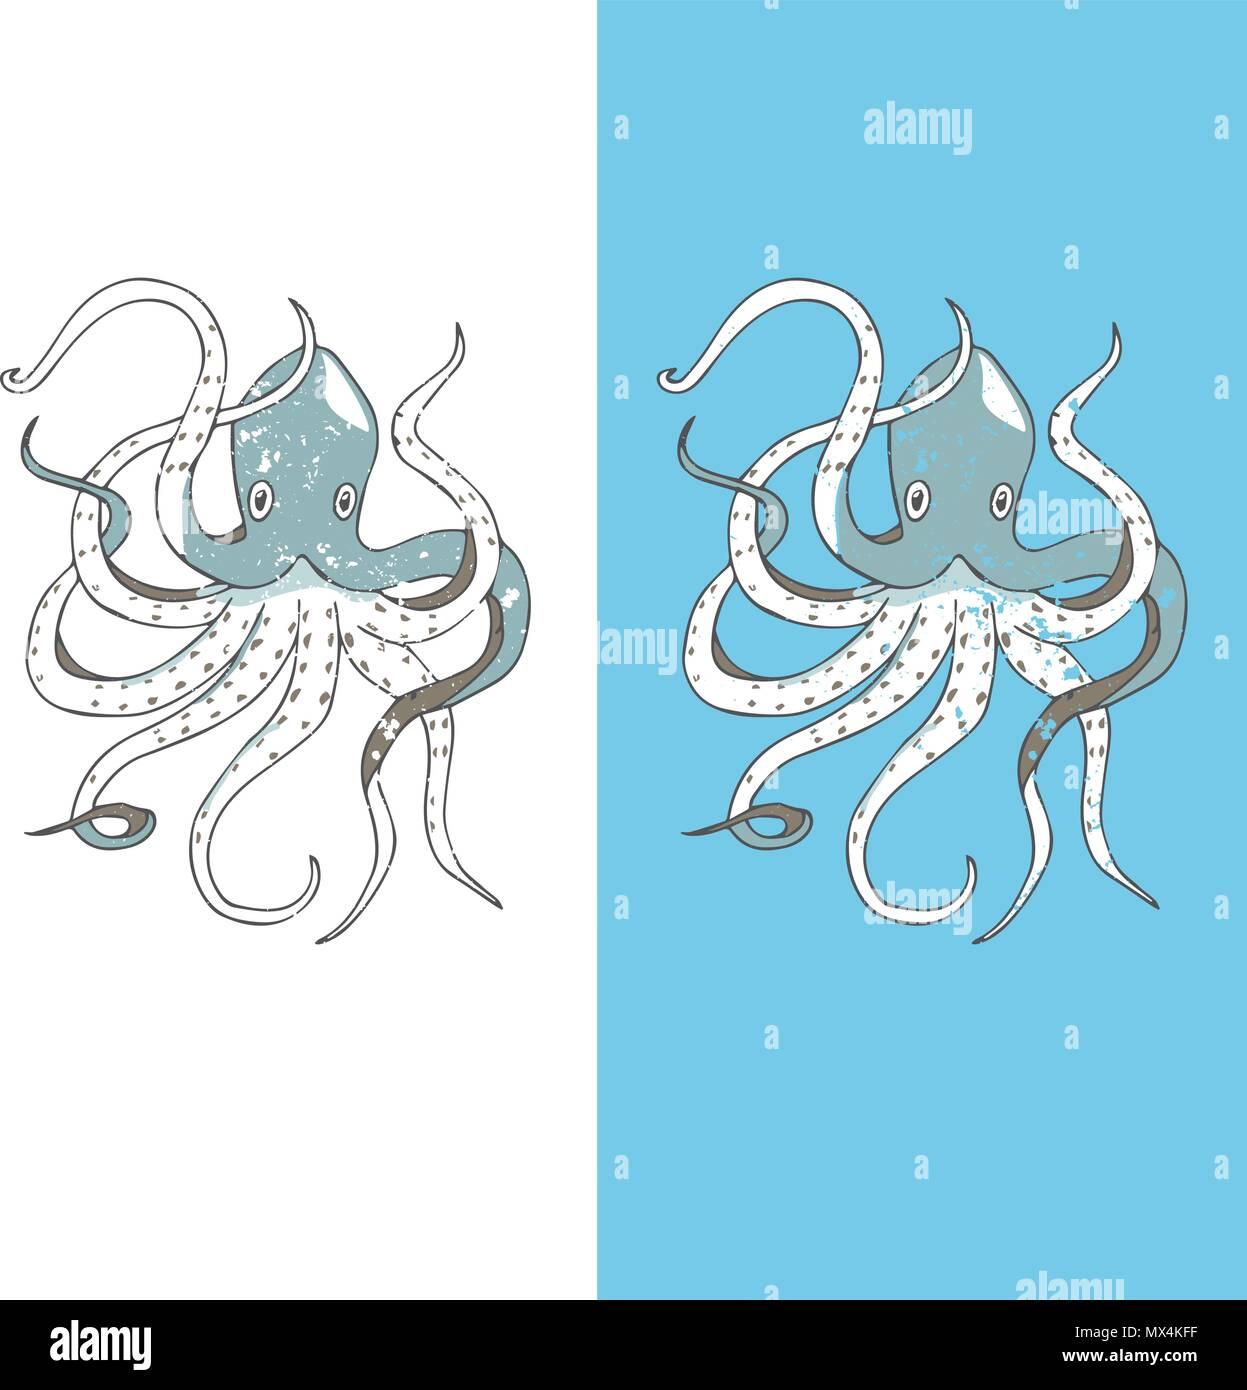 Asombroso Dibujo De Iguana Marina Para Colorear Embellecimiento ...